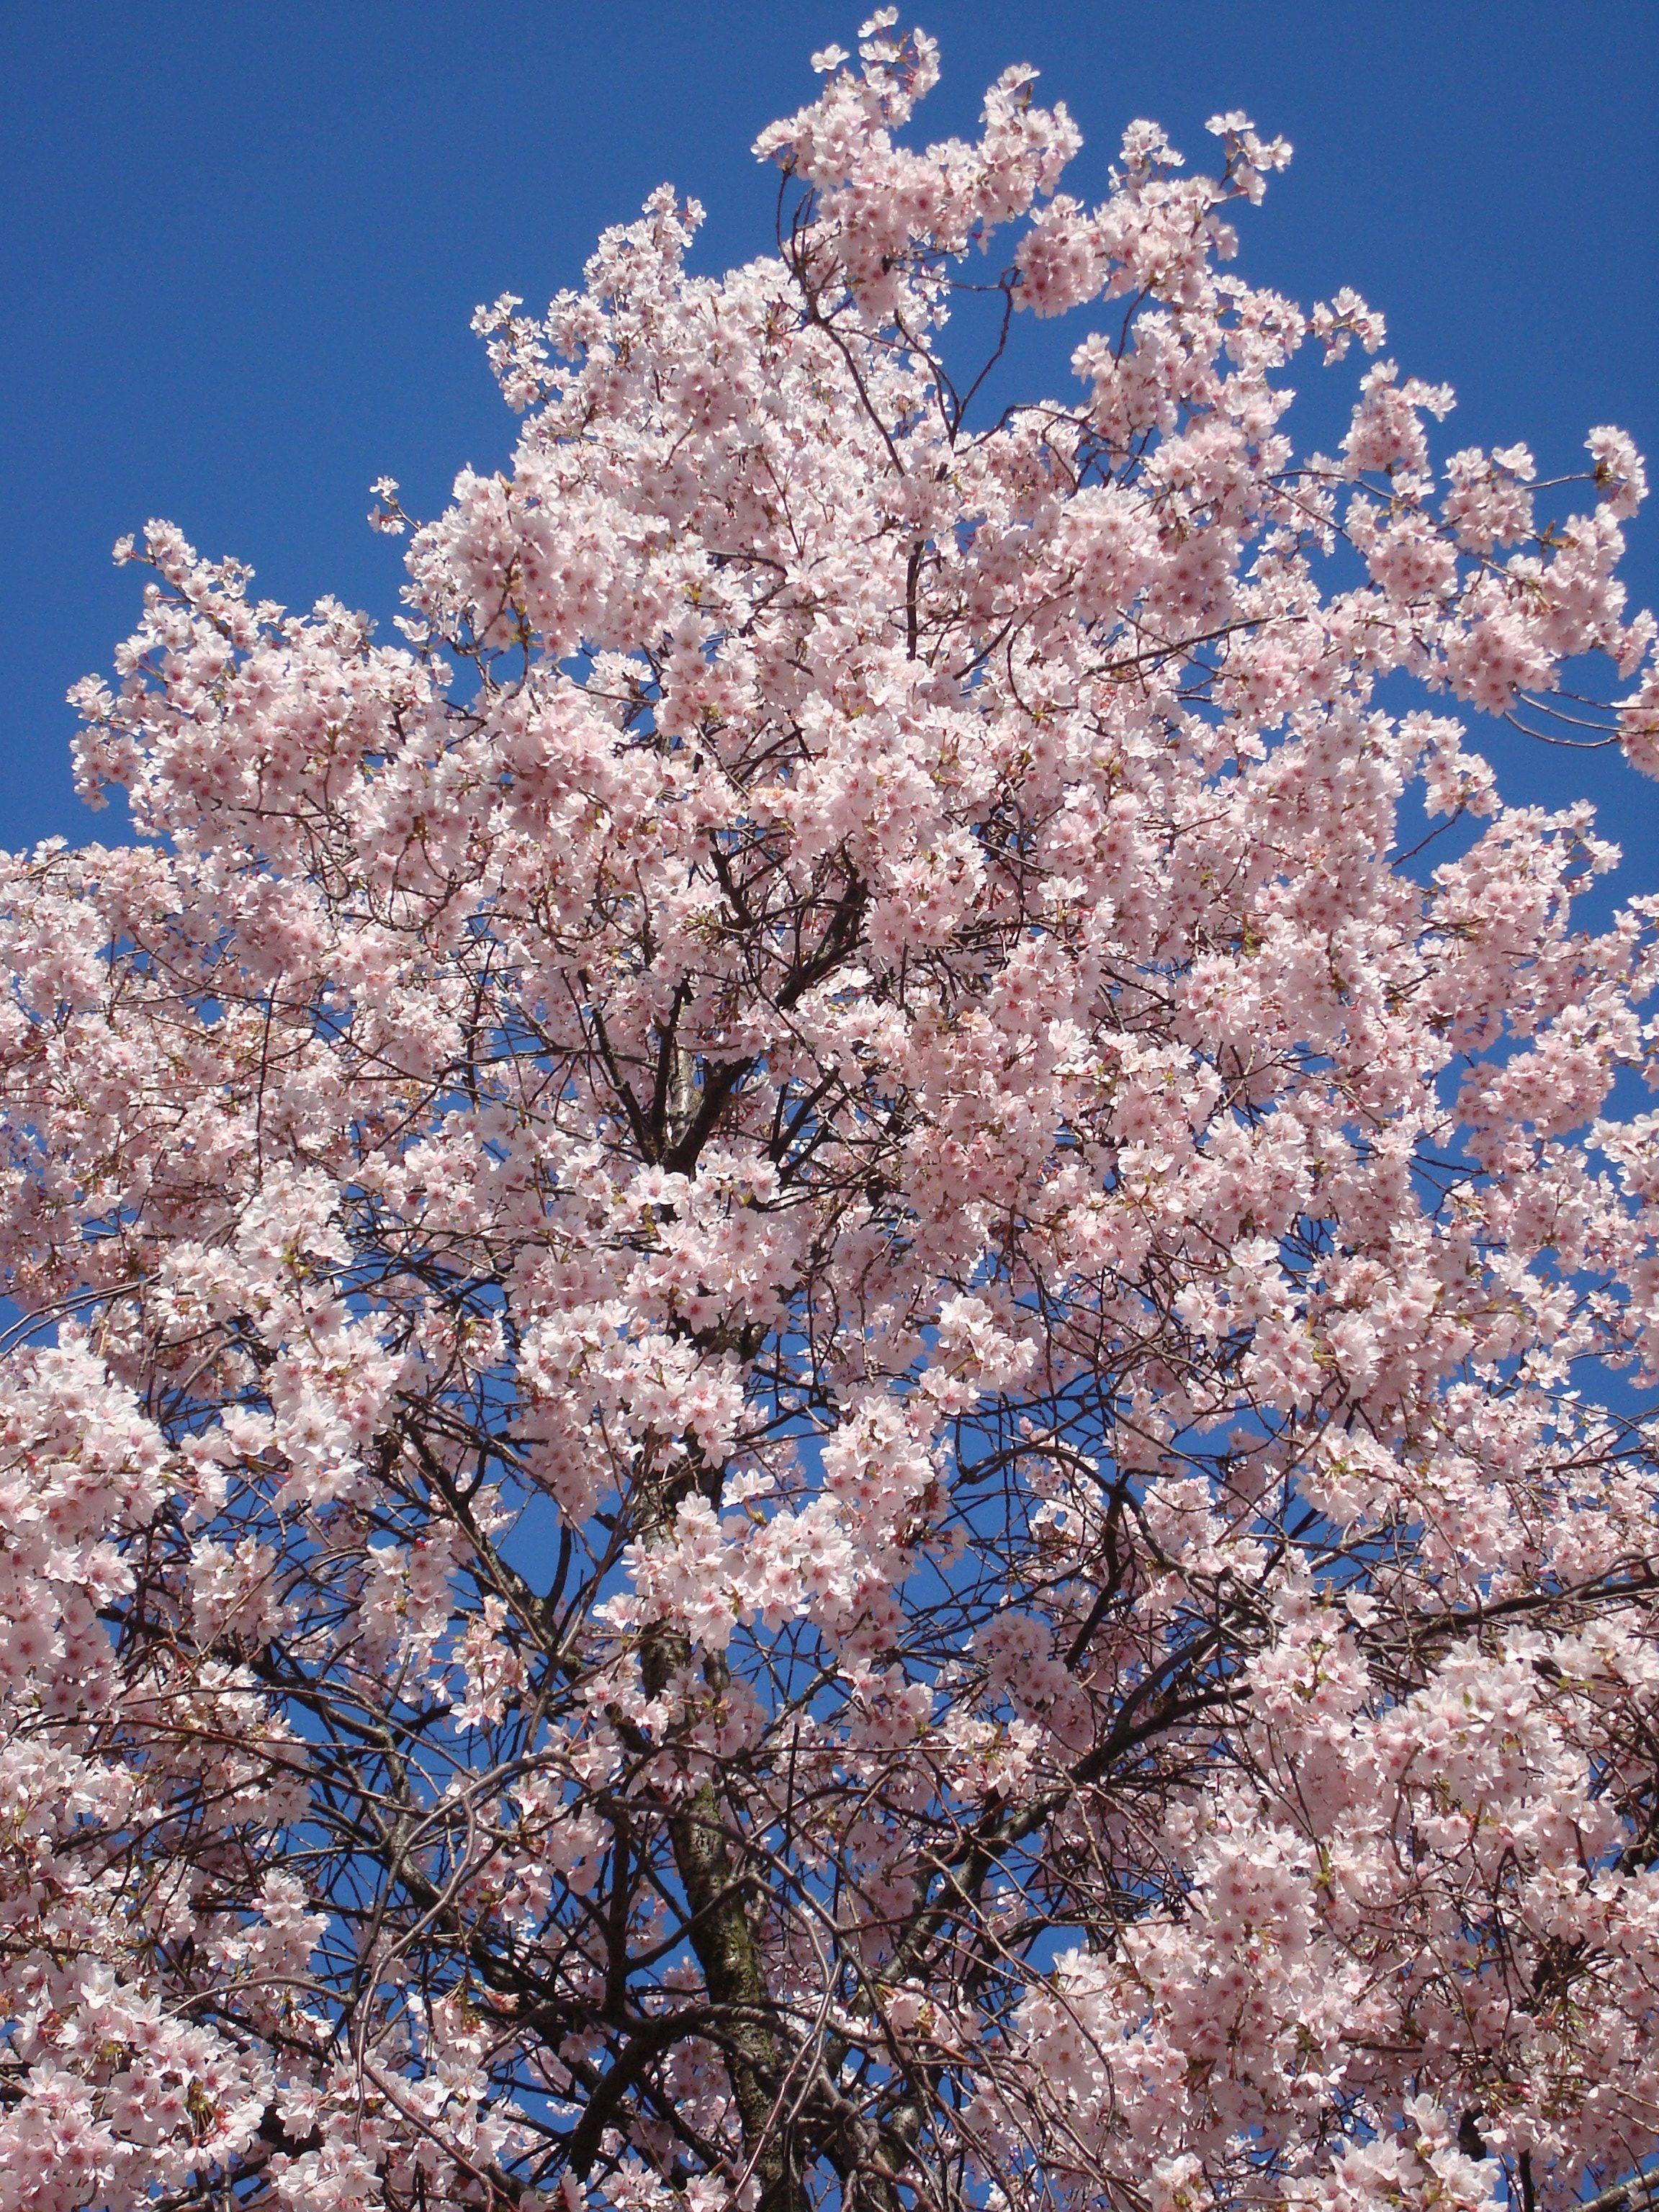 Victoria Bc Canada Cherry Blossoms West Coast Canada Vancouver Island Cherry Blossom Tree